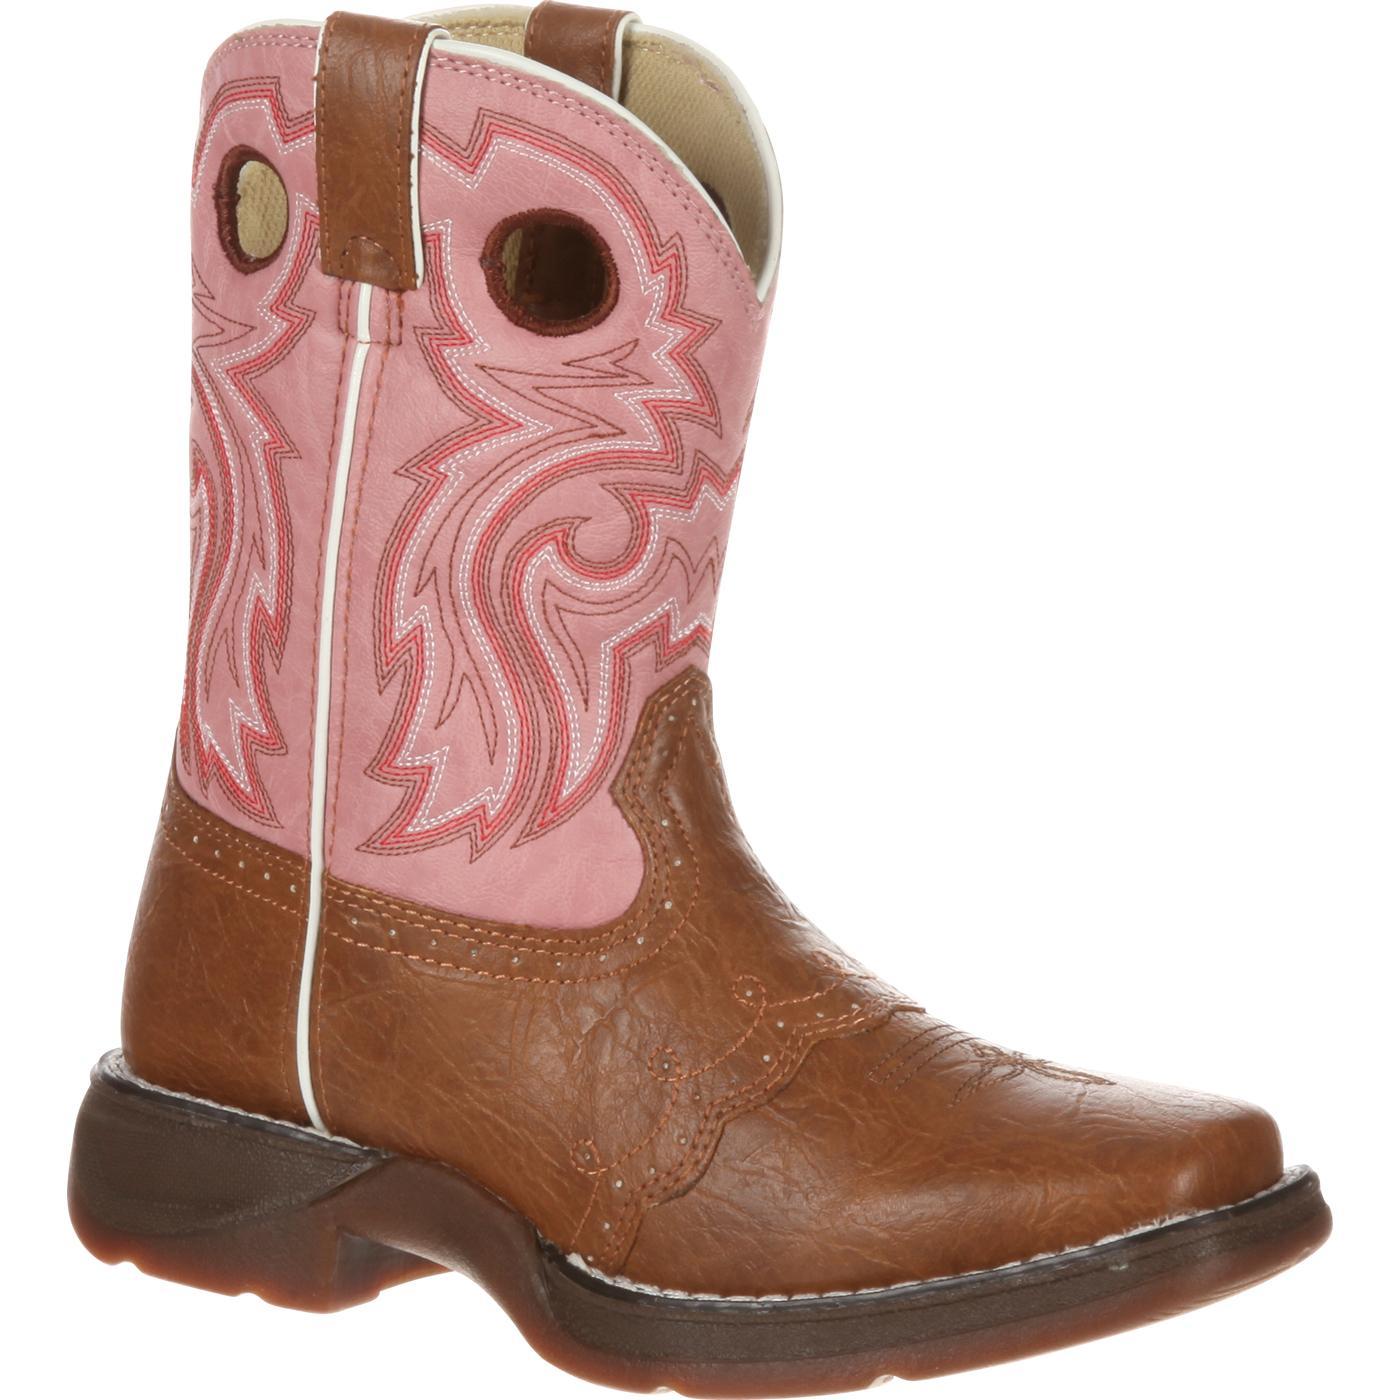 Lil' Durango: Little Kid Tan Pink Lacey Western Boot, BT287